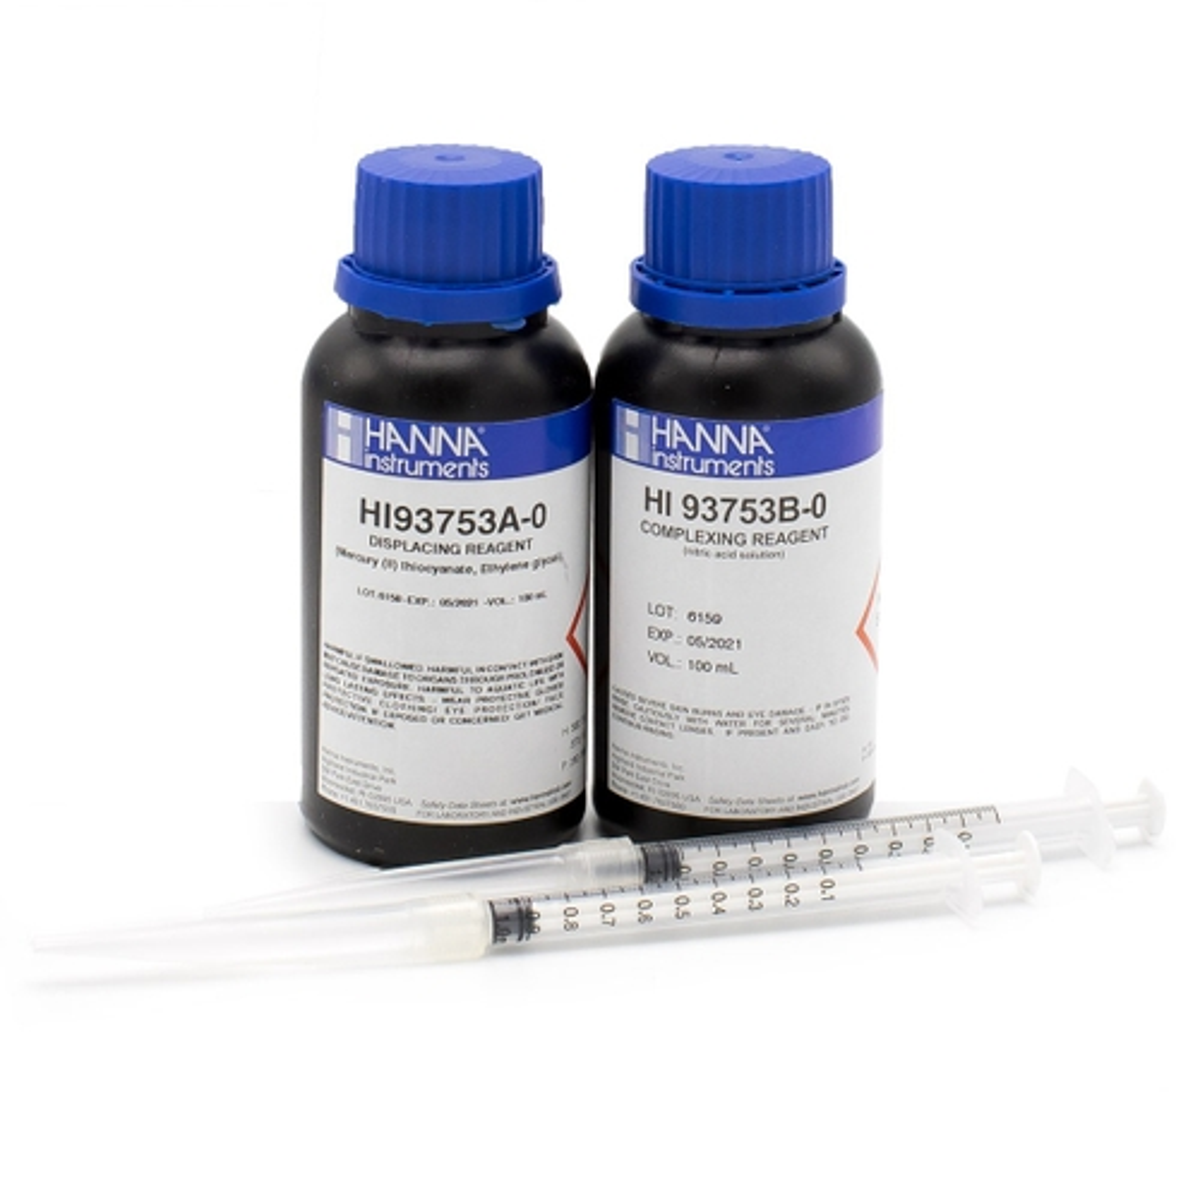 Chloride Reagents (100 tests) - HI93753-01